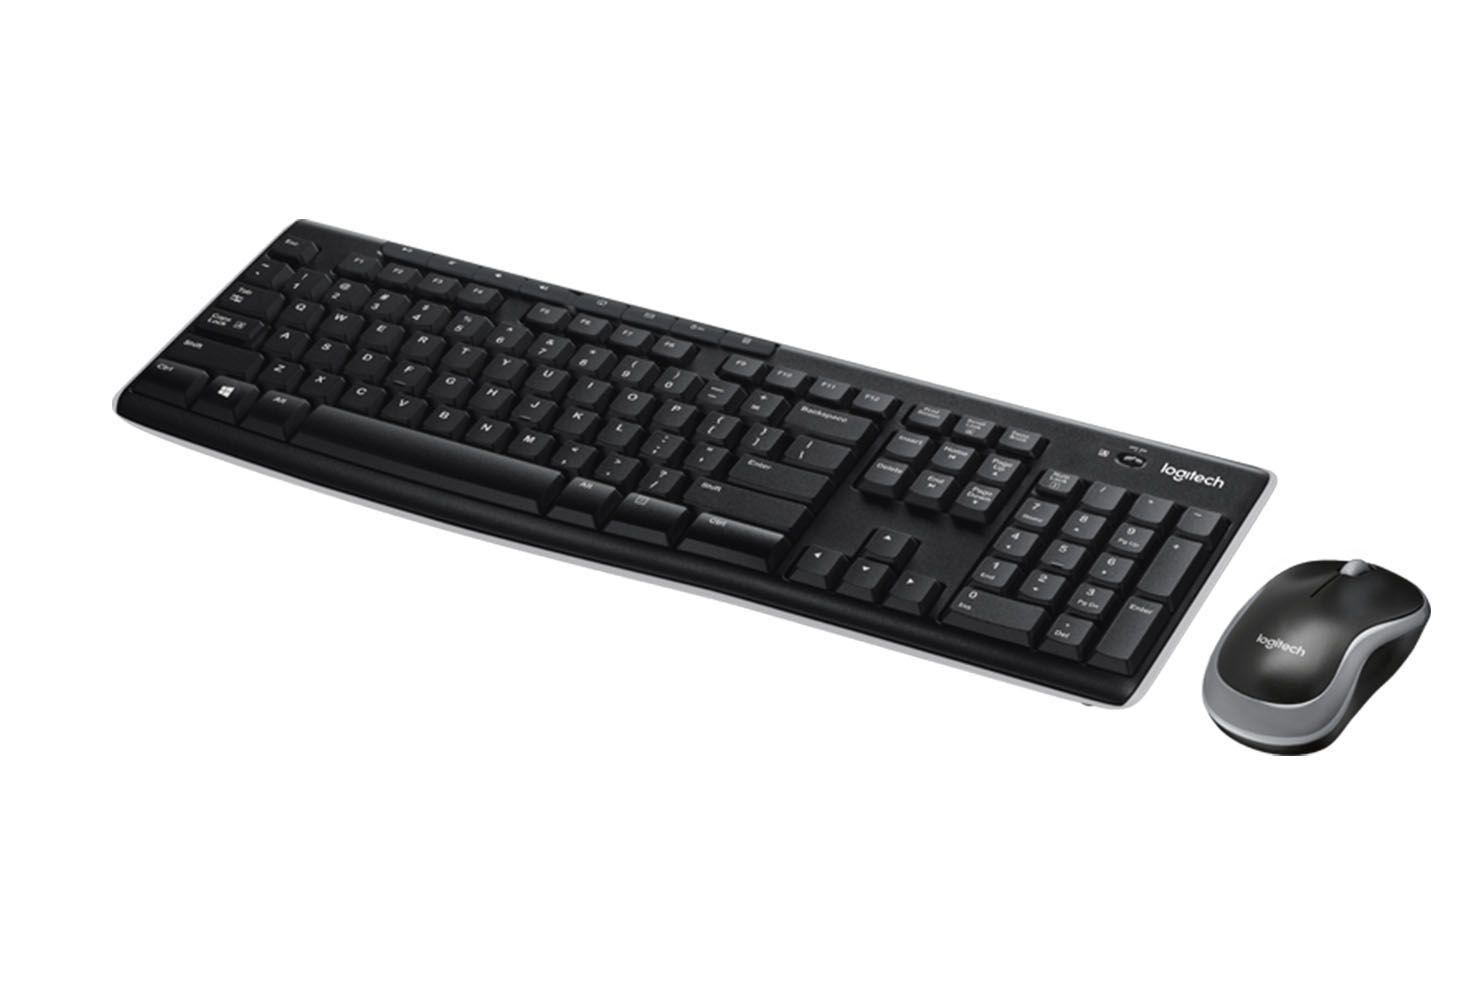 Kit Teclado e Mouse Óptico Sem Fio Mk270 Logitech